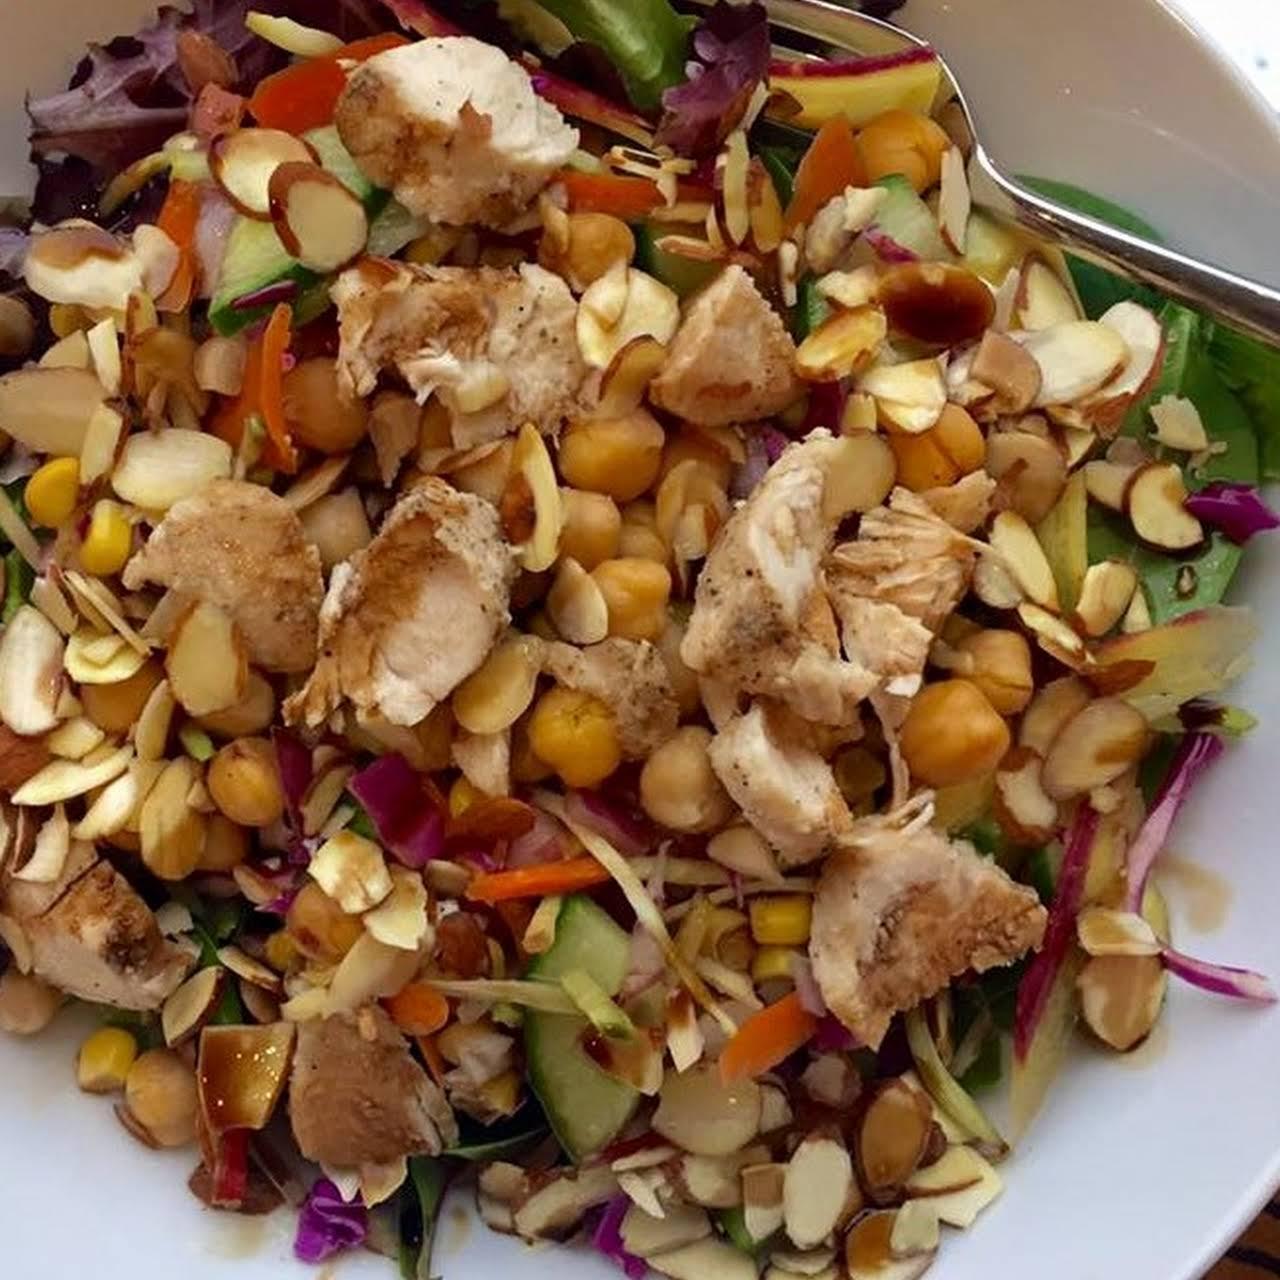 Chicken Salad Recipe With Cream Cheese